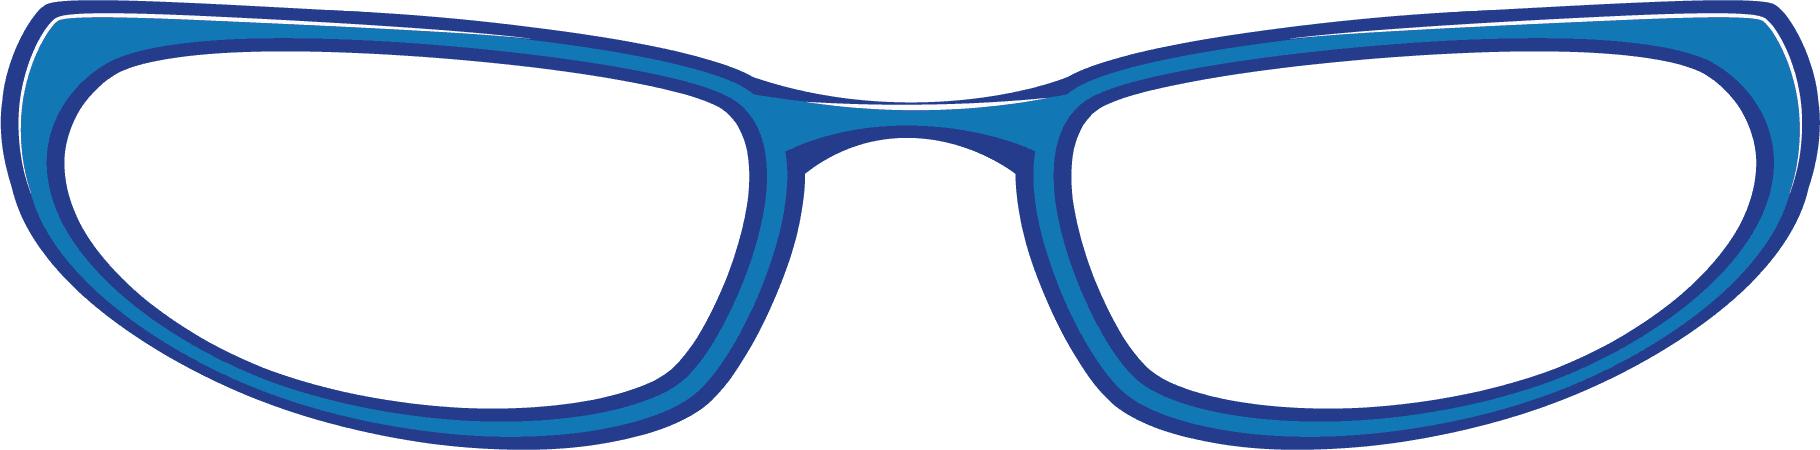 Hypnotic clipart eye glass Frames free clipart Eyeglasses clip